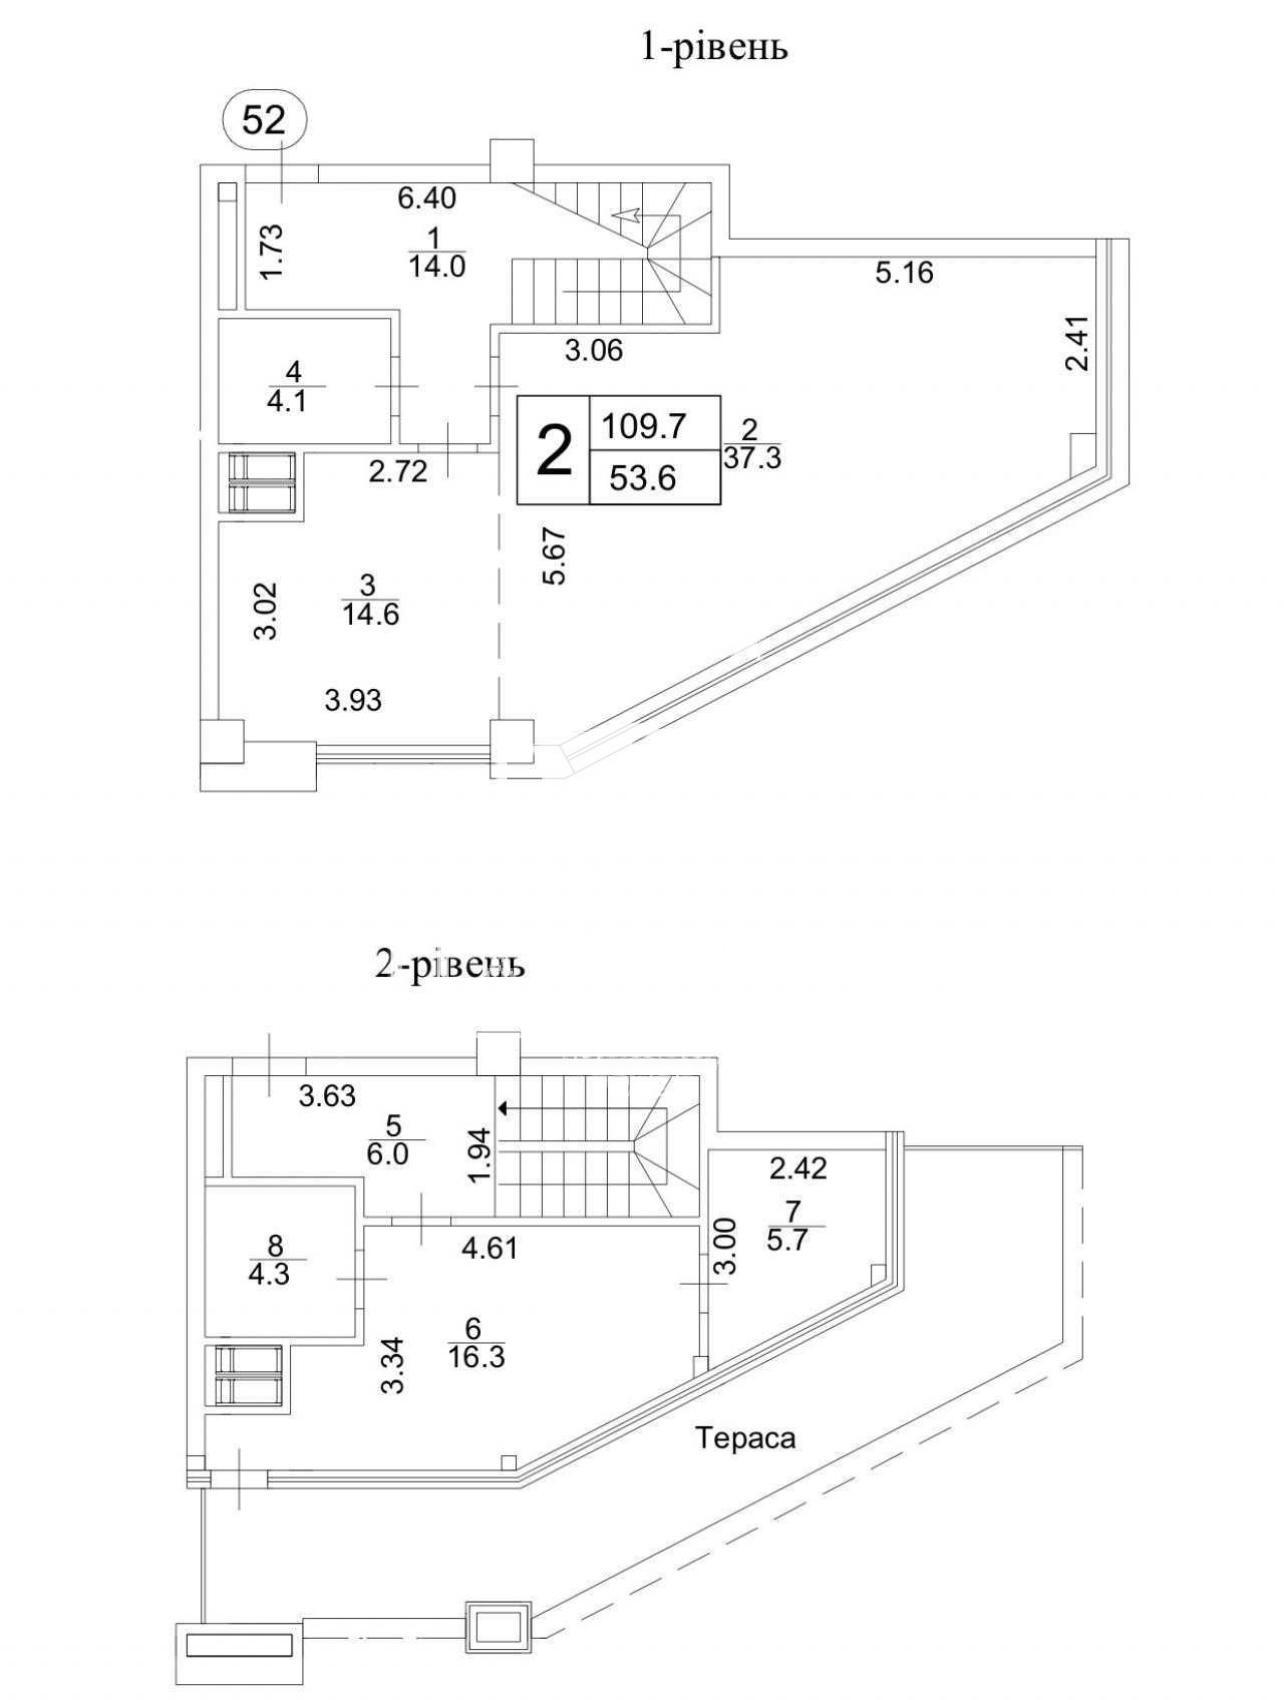 C2EB3674-FF67-4AA7-BAB1-69A6150BD175.jpeg